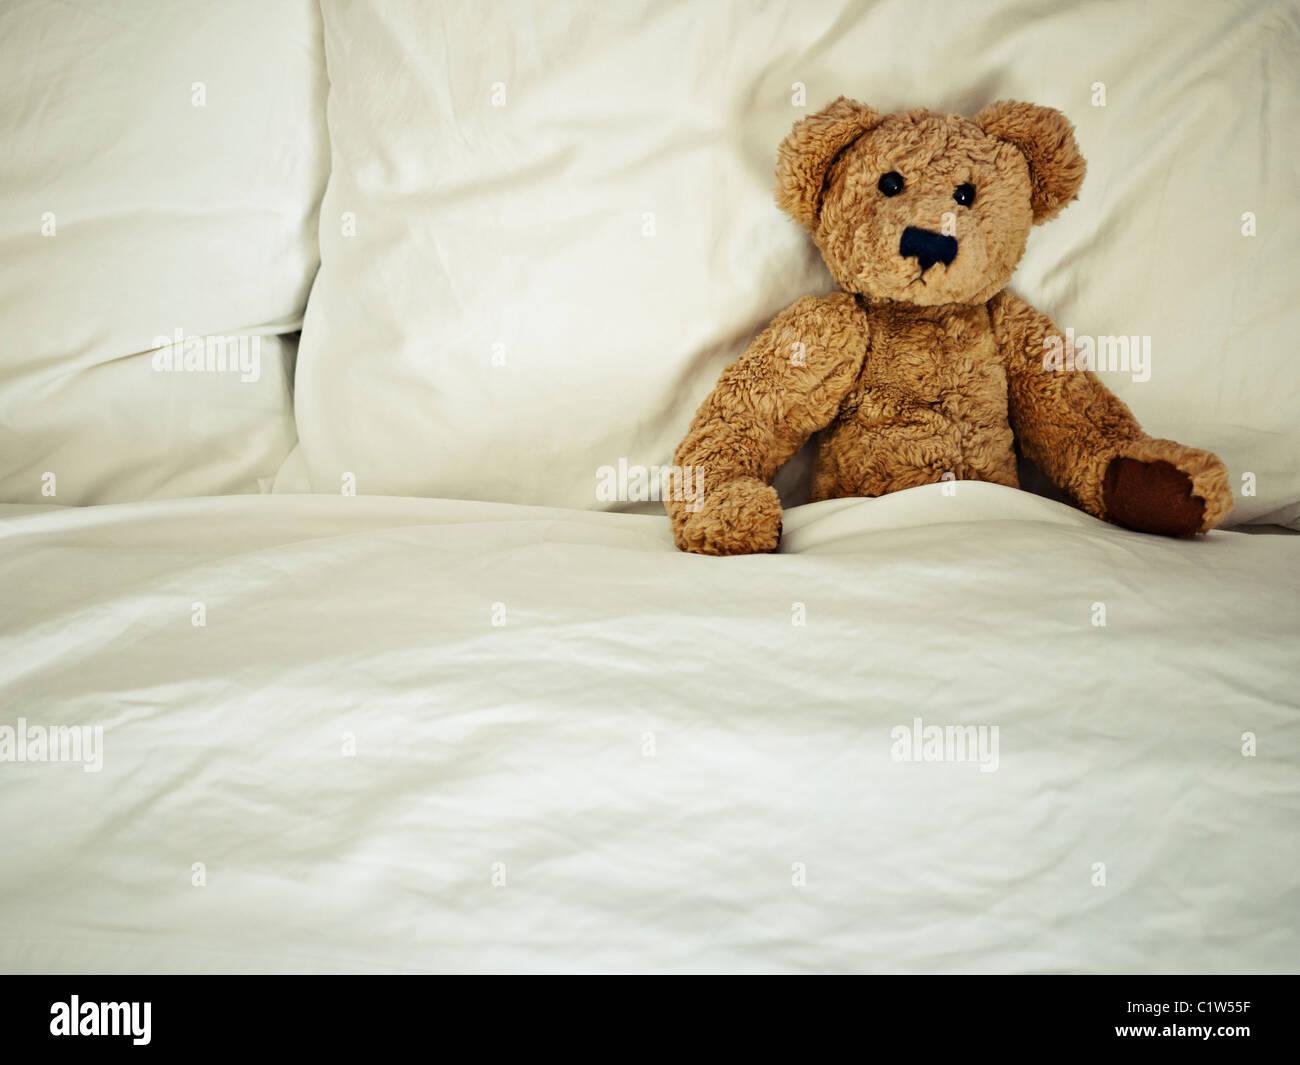 Teddy Bear In Bed Stock Photo 35588267 Alamy